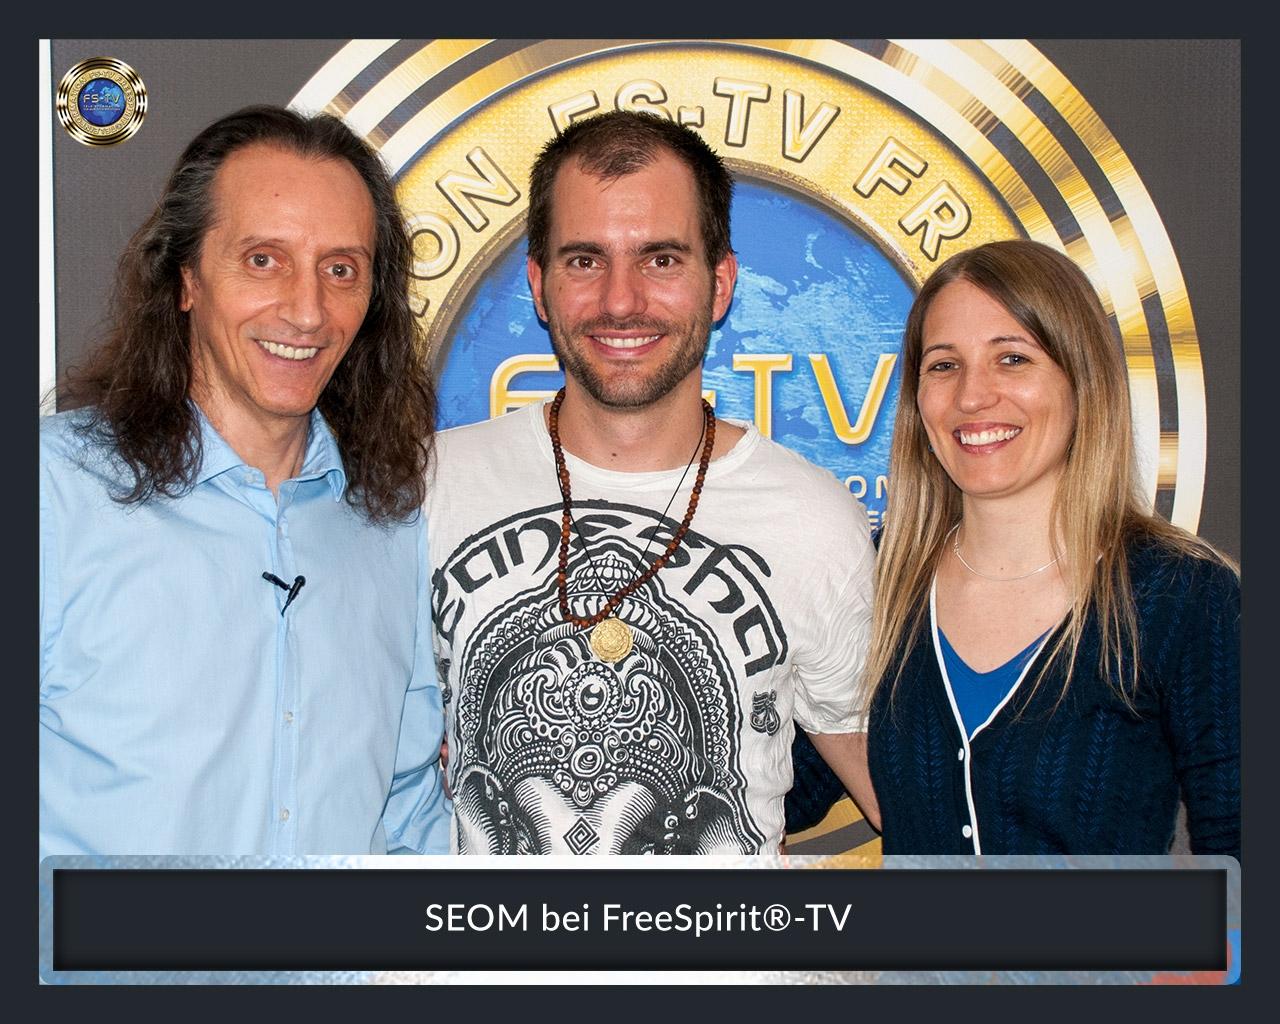 FS-TV-Bildergallerie-FS-SEOM-1